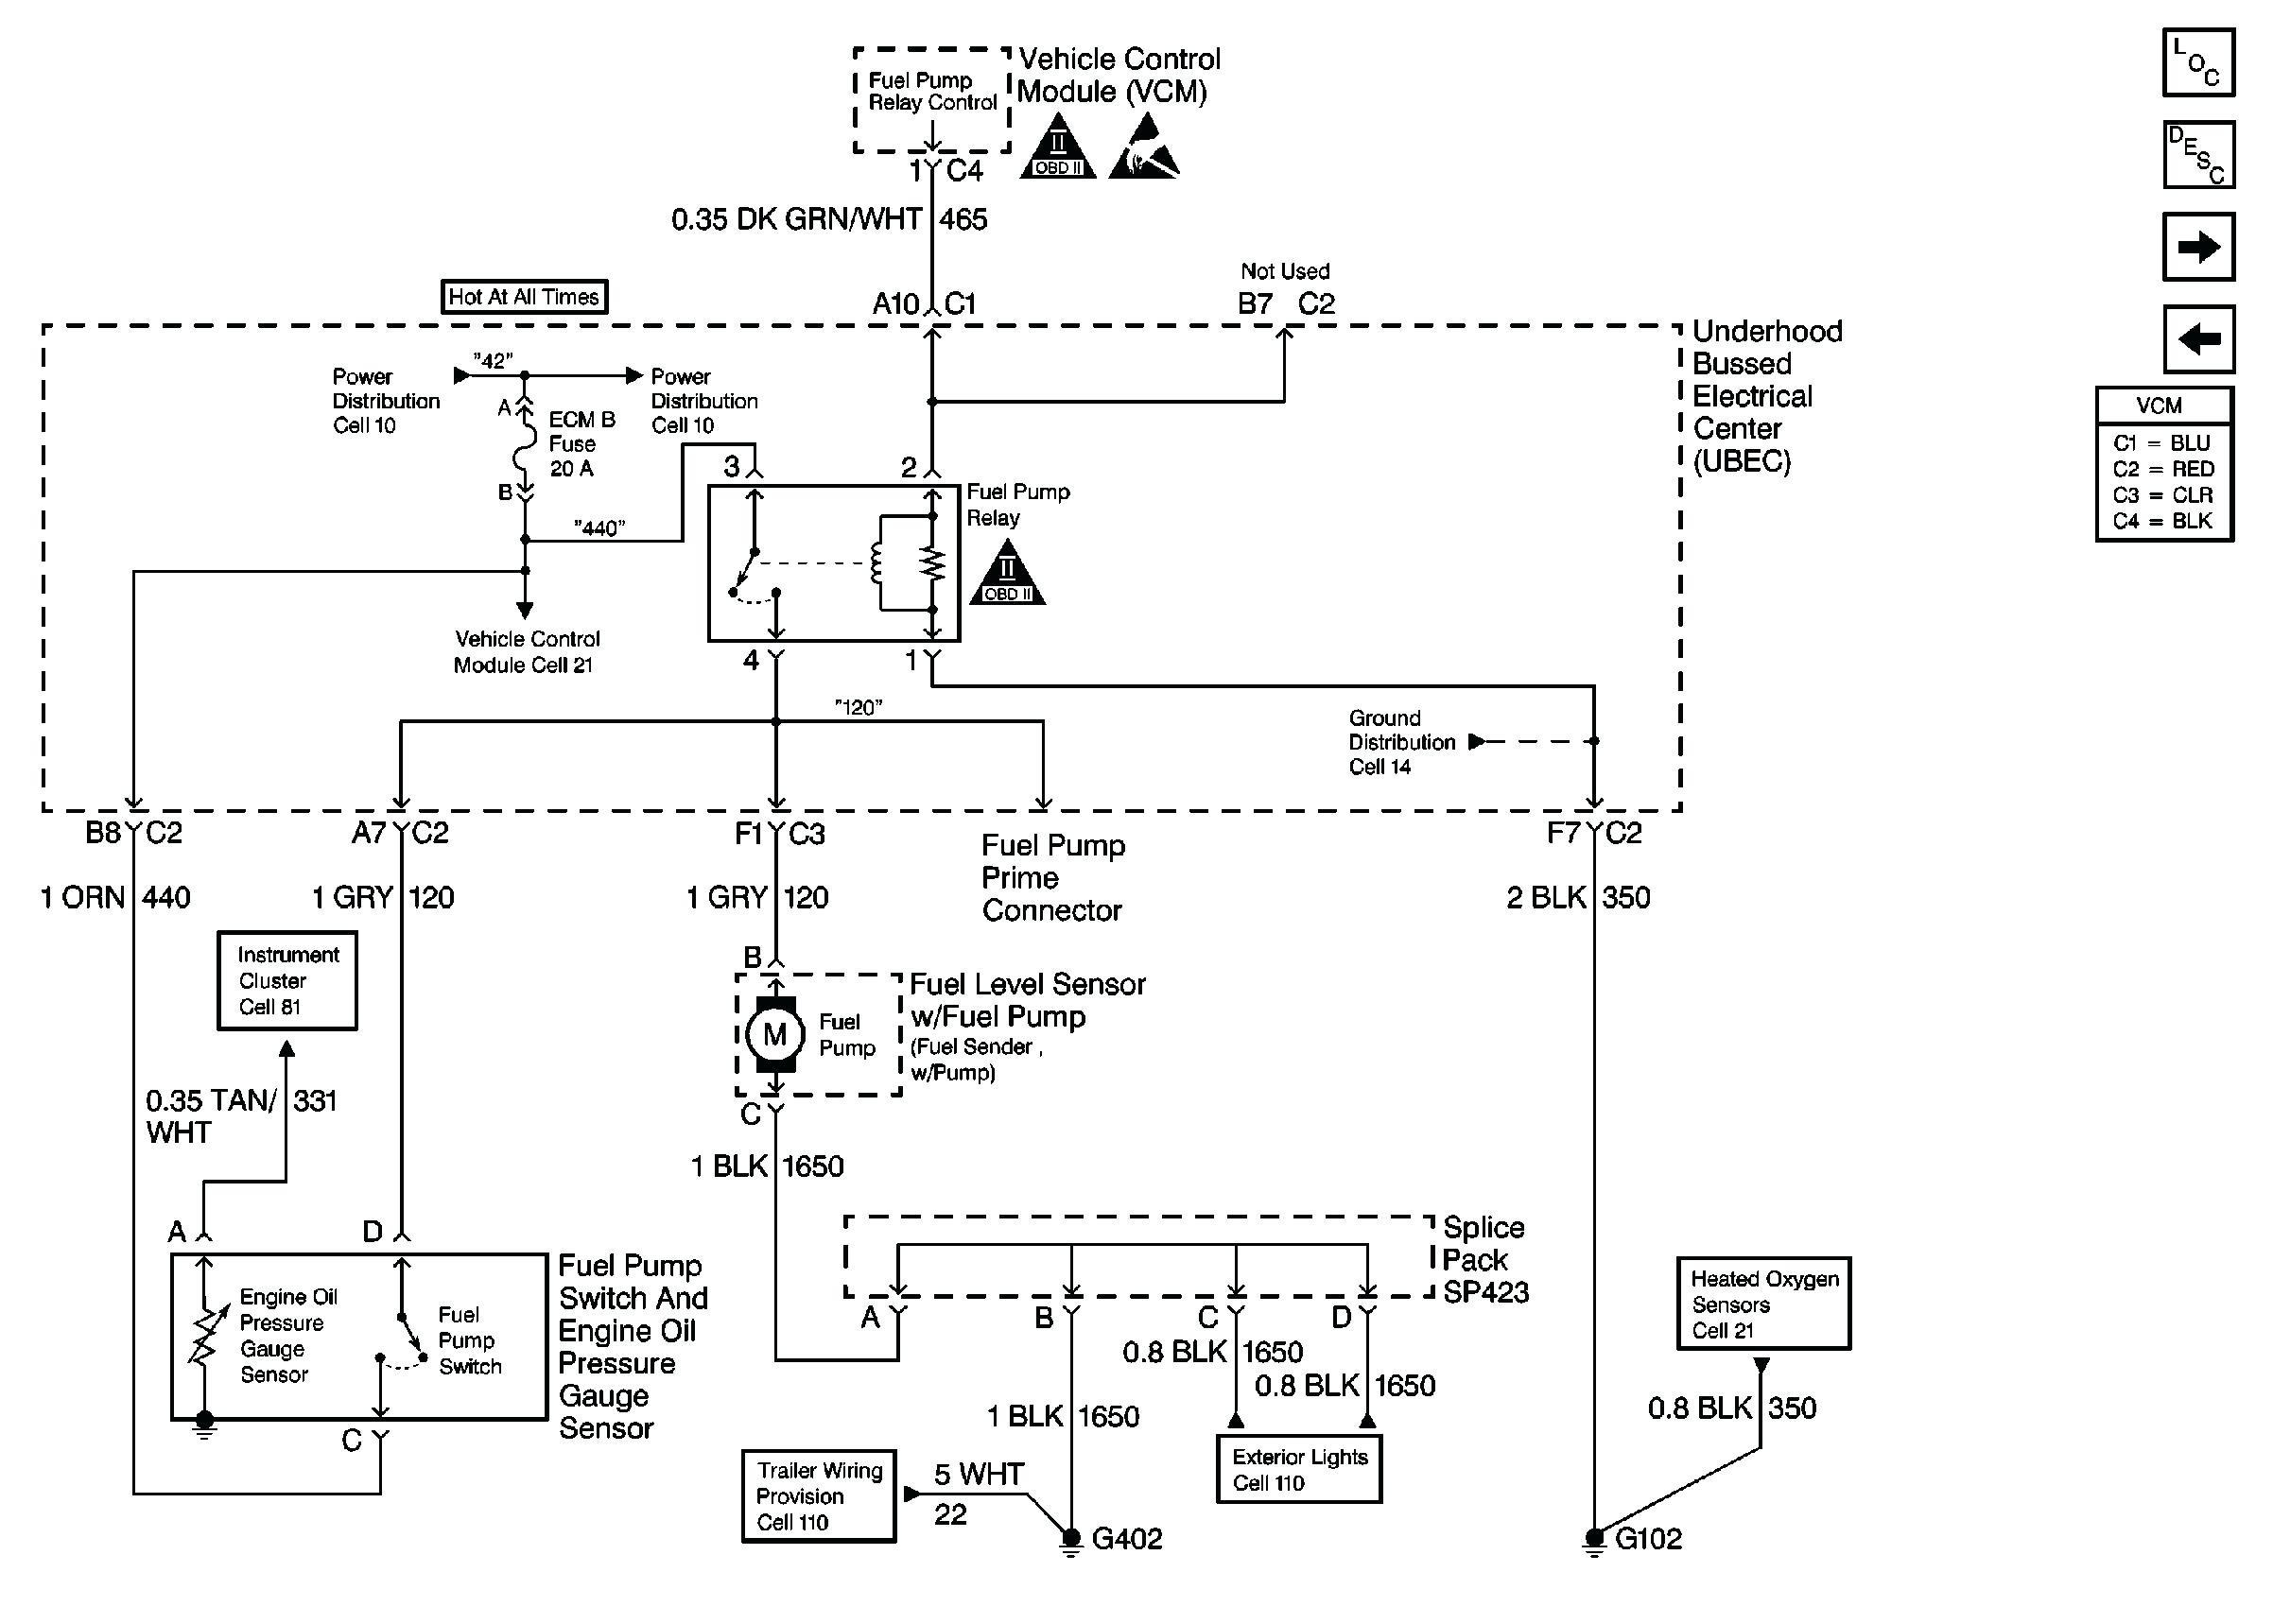 Best solutions 2000 Chevy Blazer Wiring Diagram New 2000 Chevy Blazer Radio Wiring About Chevy S10 Blazer Radio Wiring Diagram